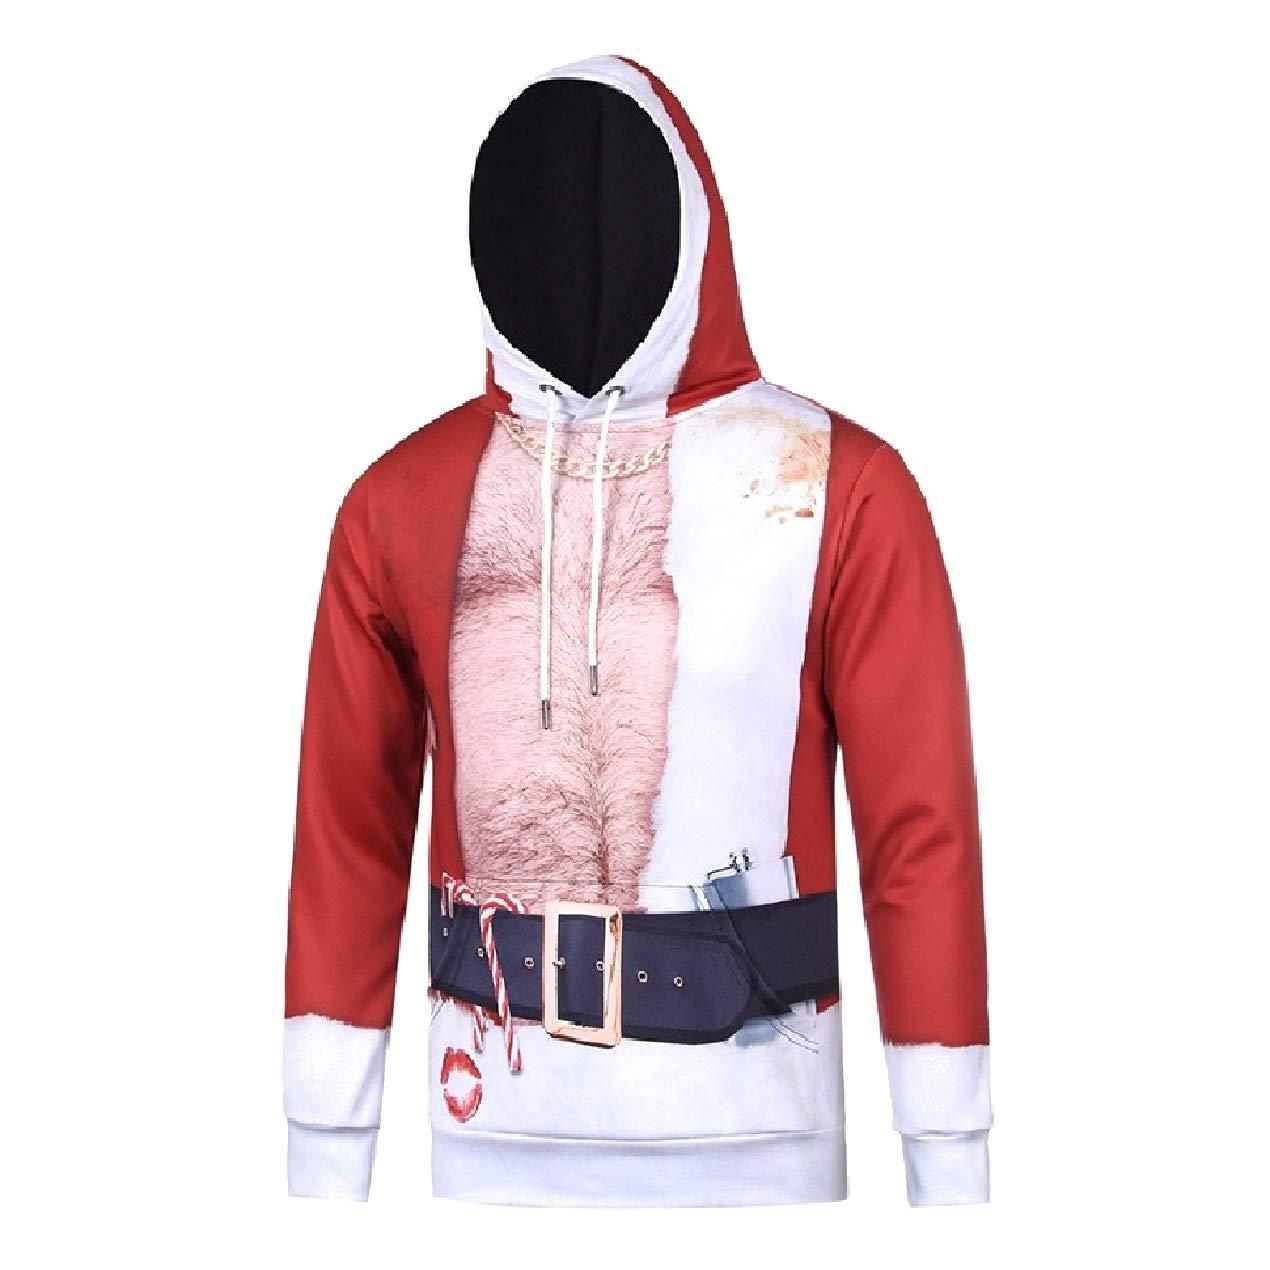 Winwinus Men Plus-Size Funny Pullover Christmas Xmas Sweatshirt Hoodies